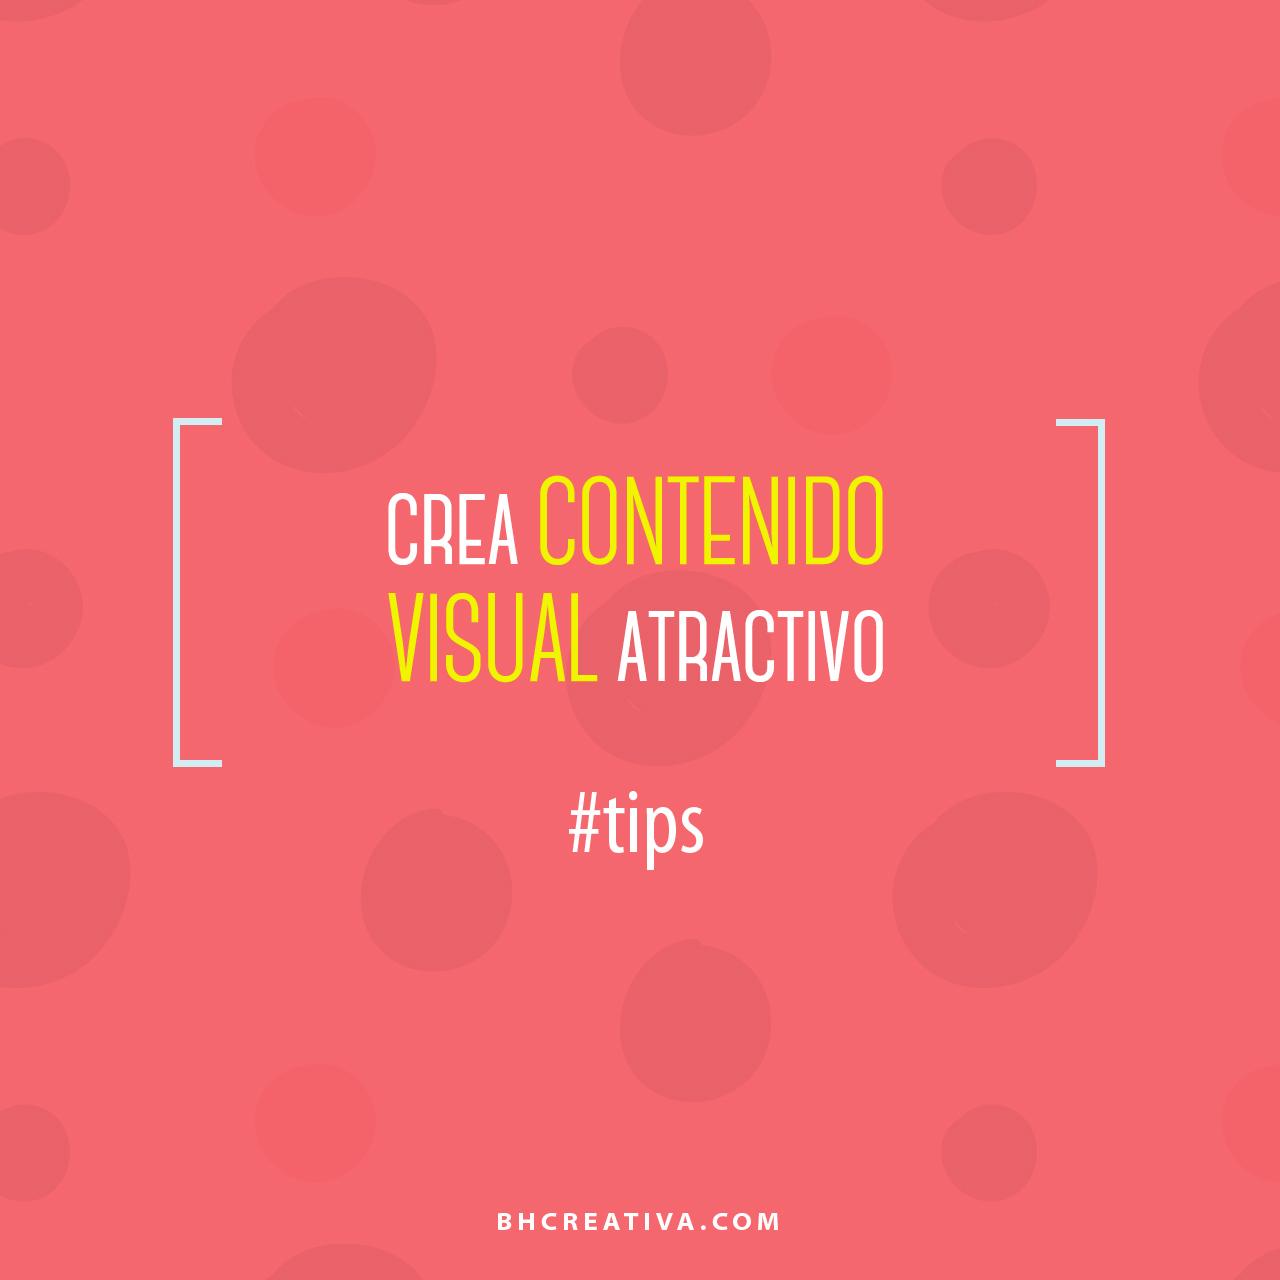 Crea-contenido-audiovisual-atractivo1